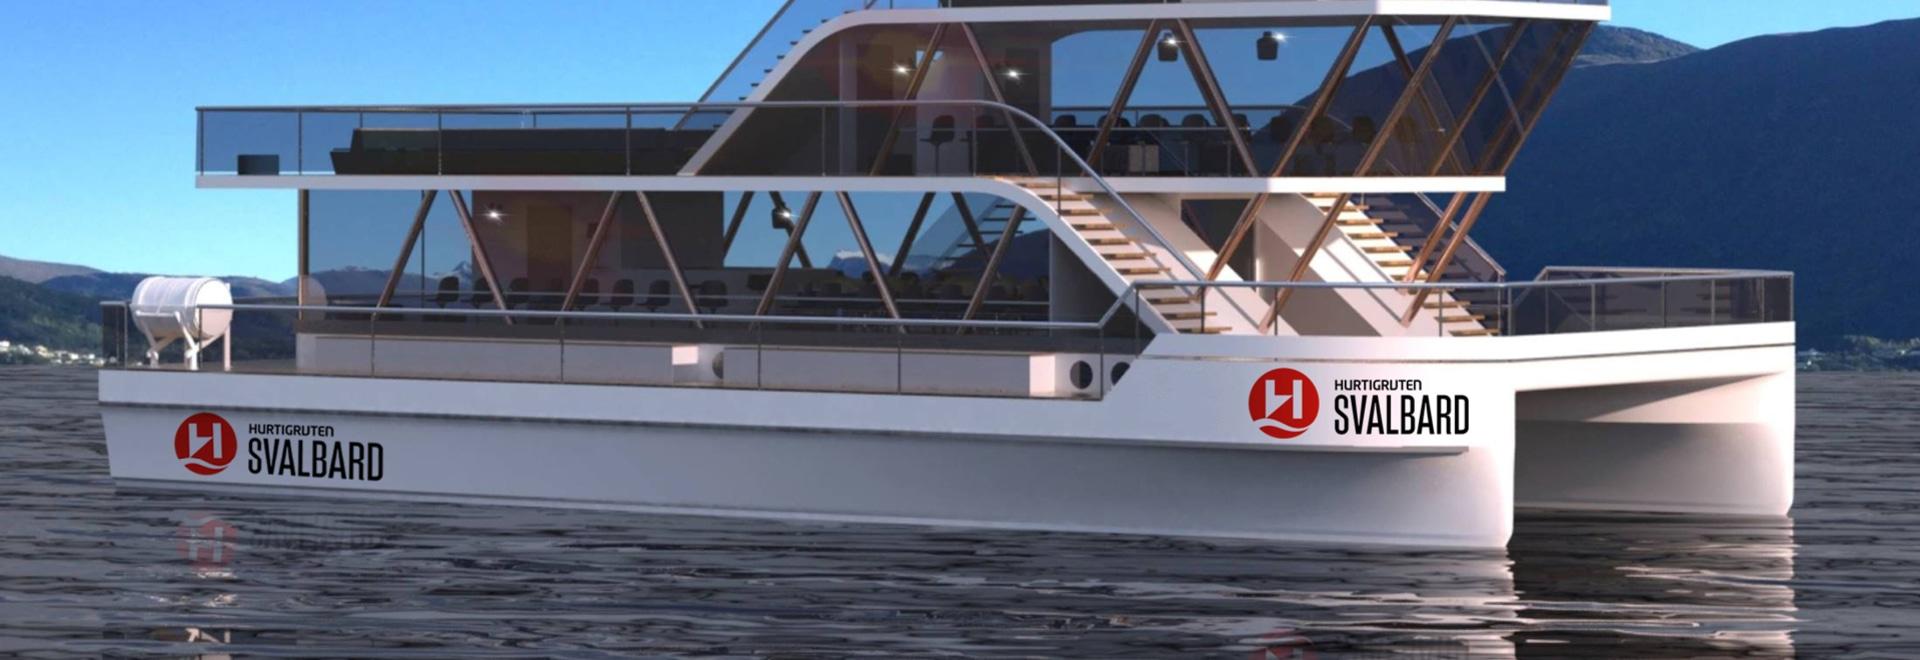 Hurtigruten to build all-electric explorer catamarans